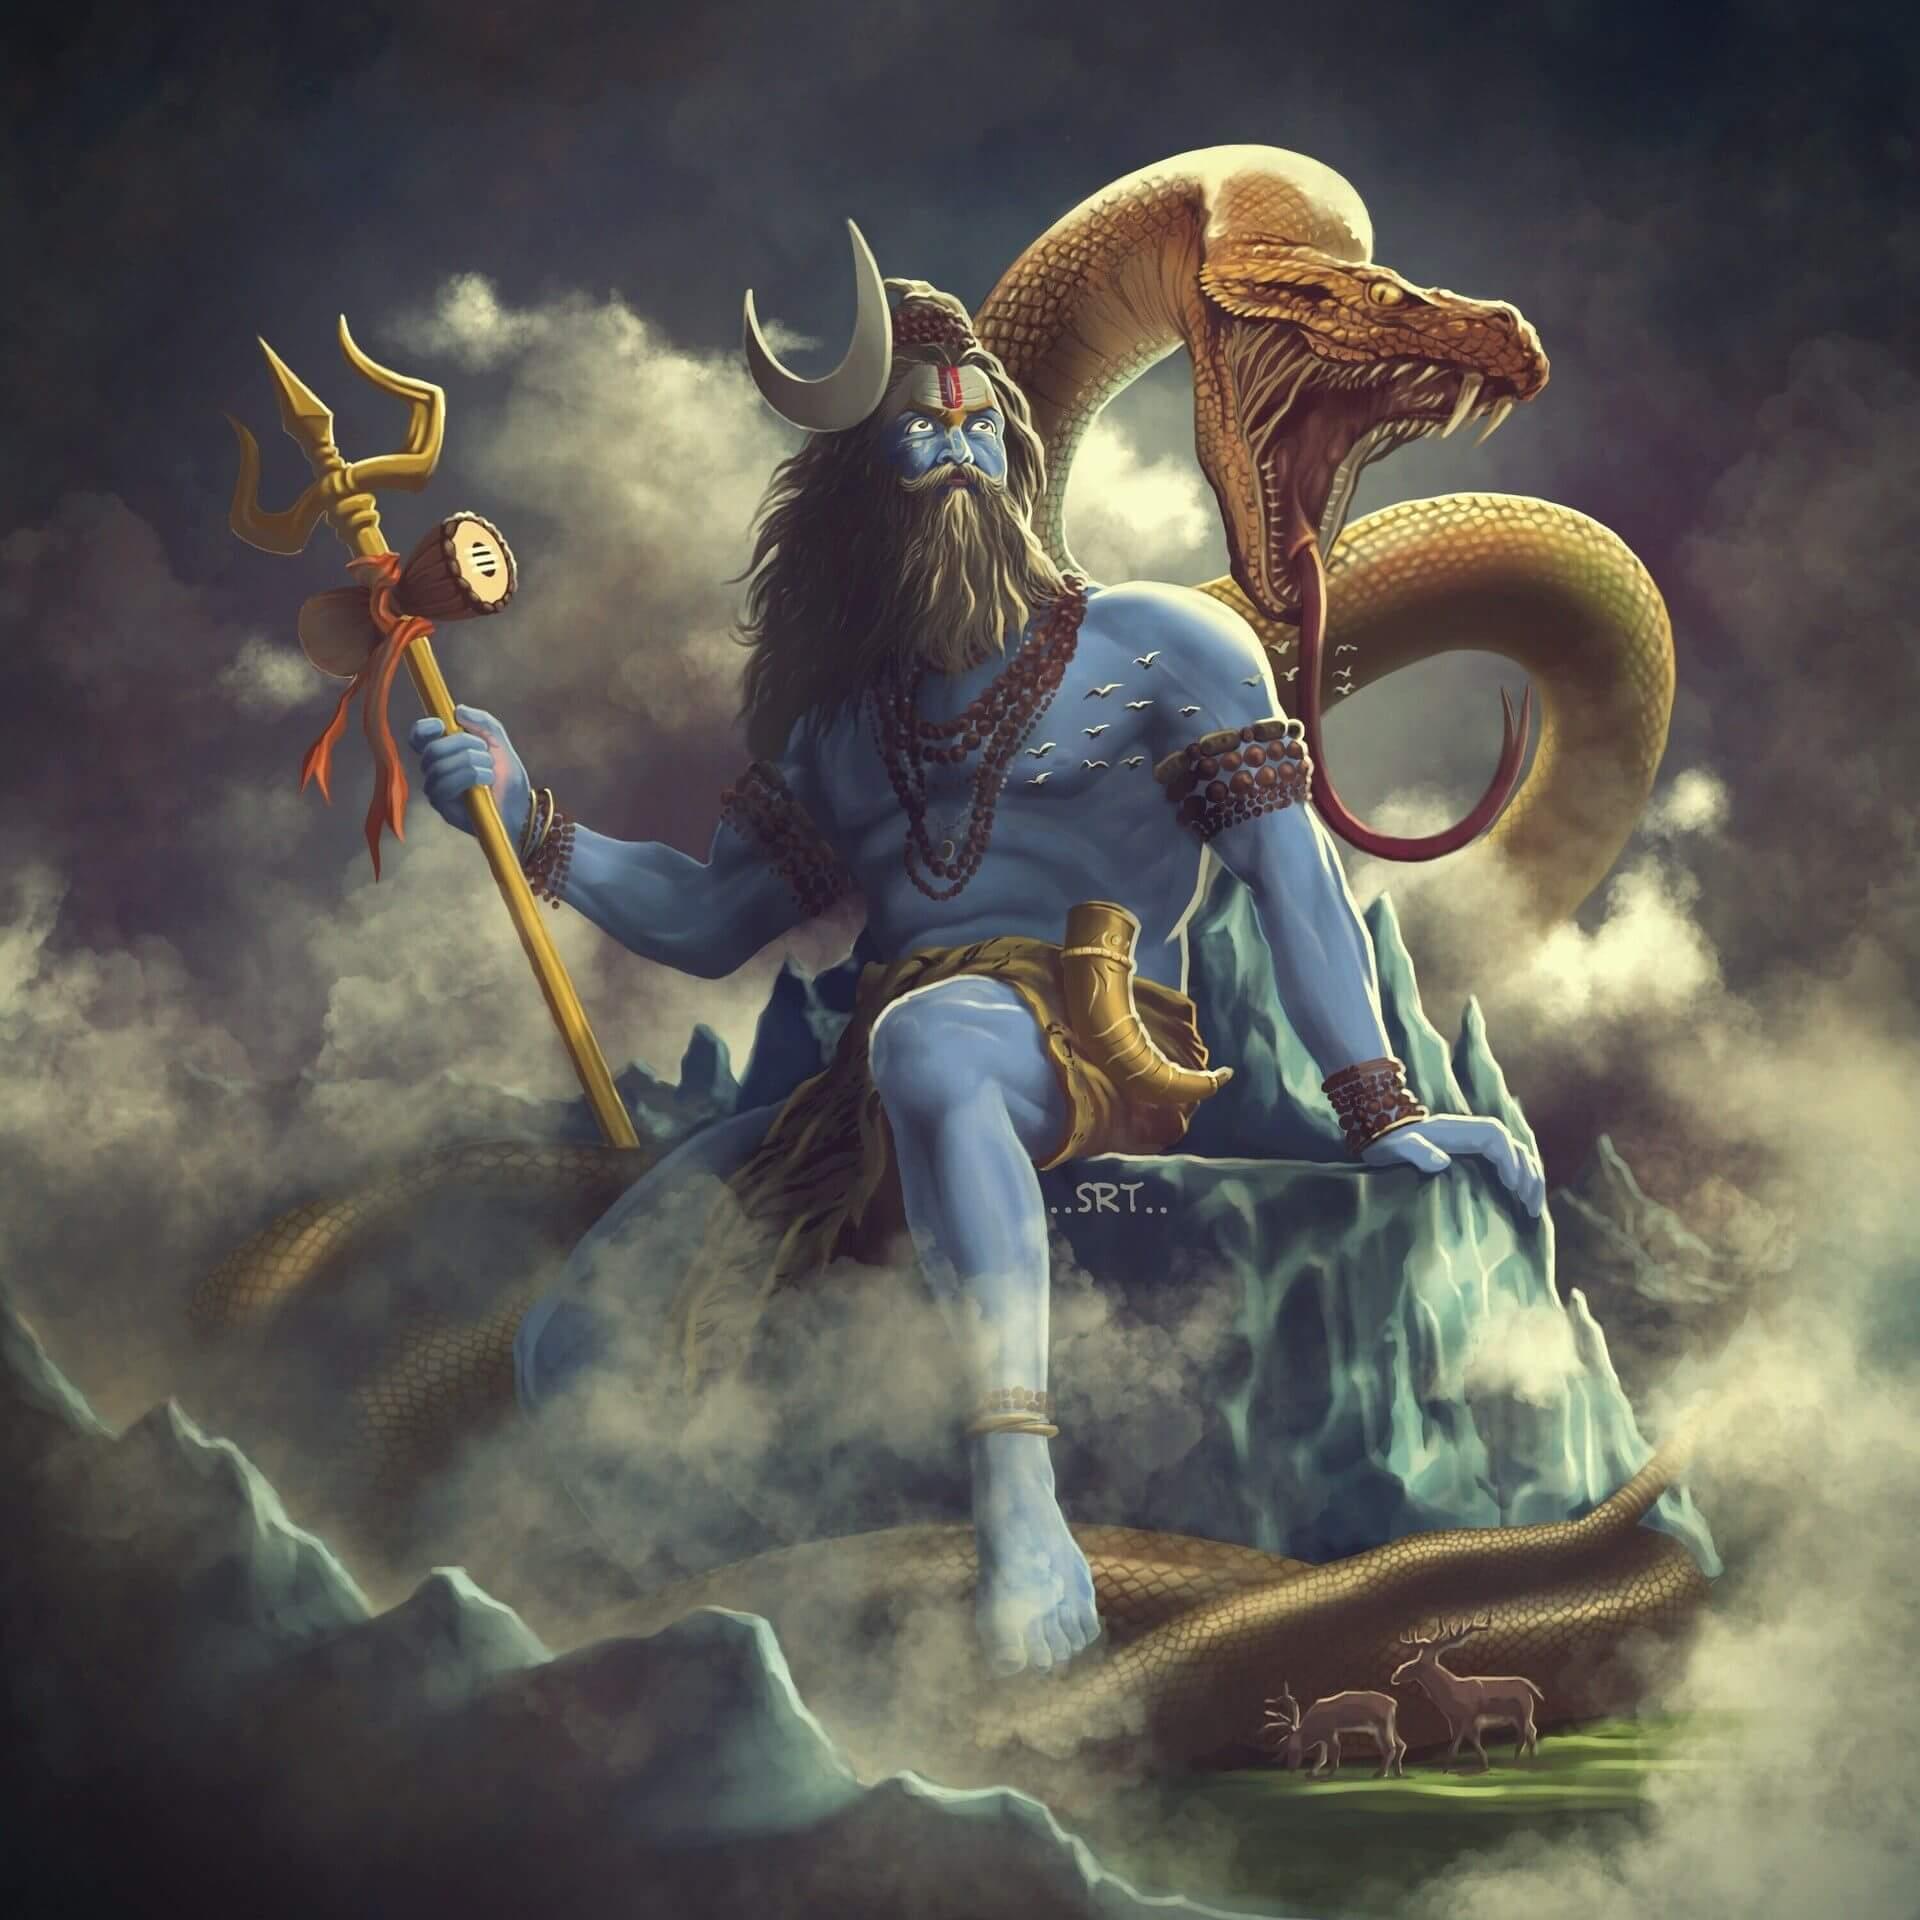 Lord shiva angry animated 3d wallpapers inspirational aghori shiva